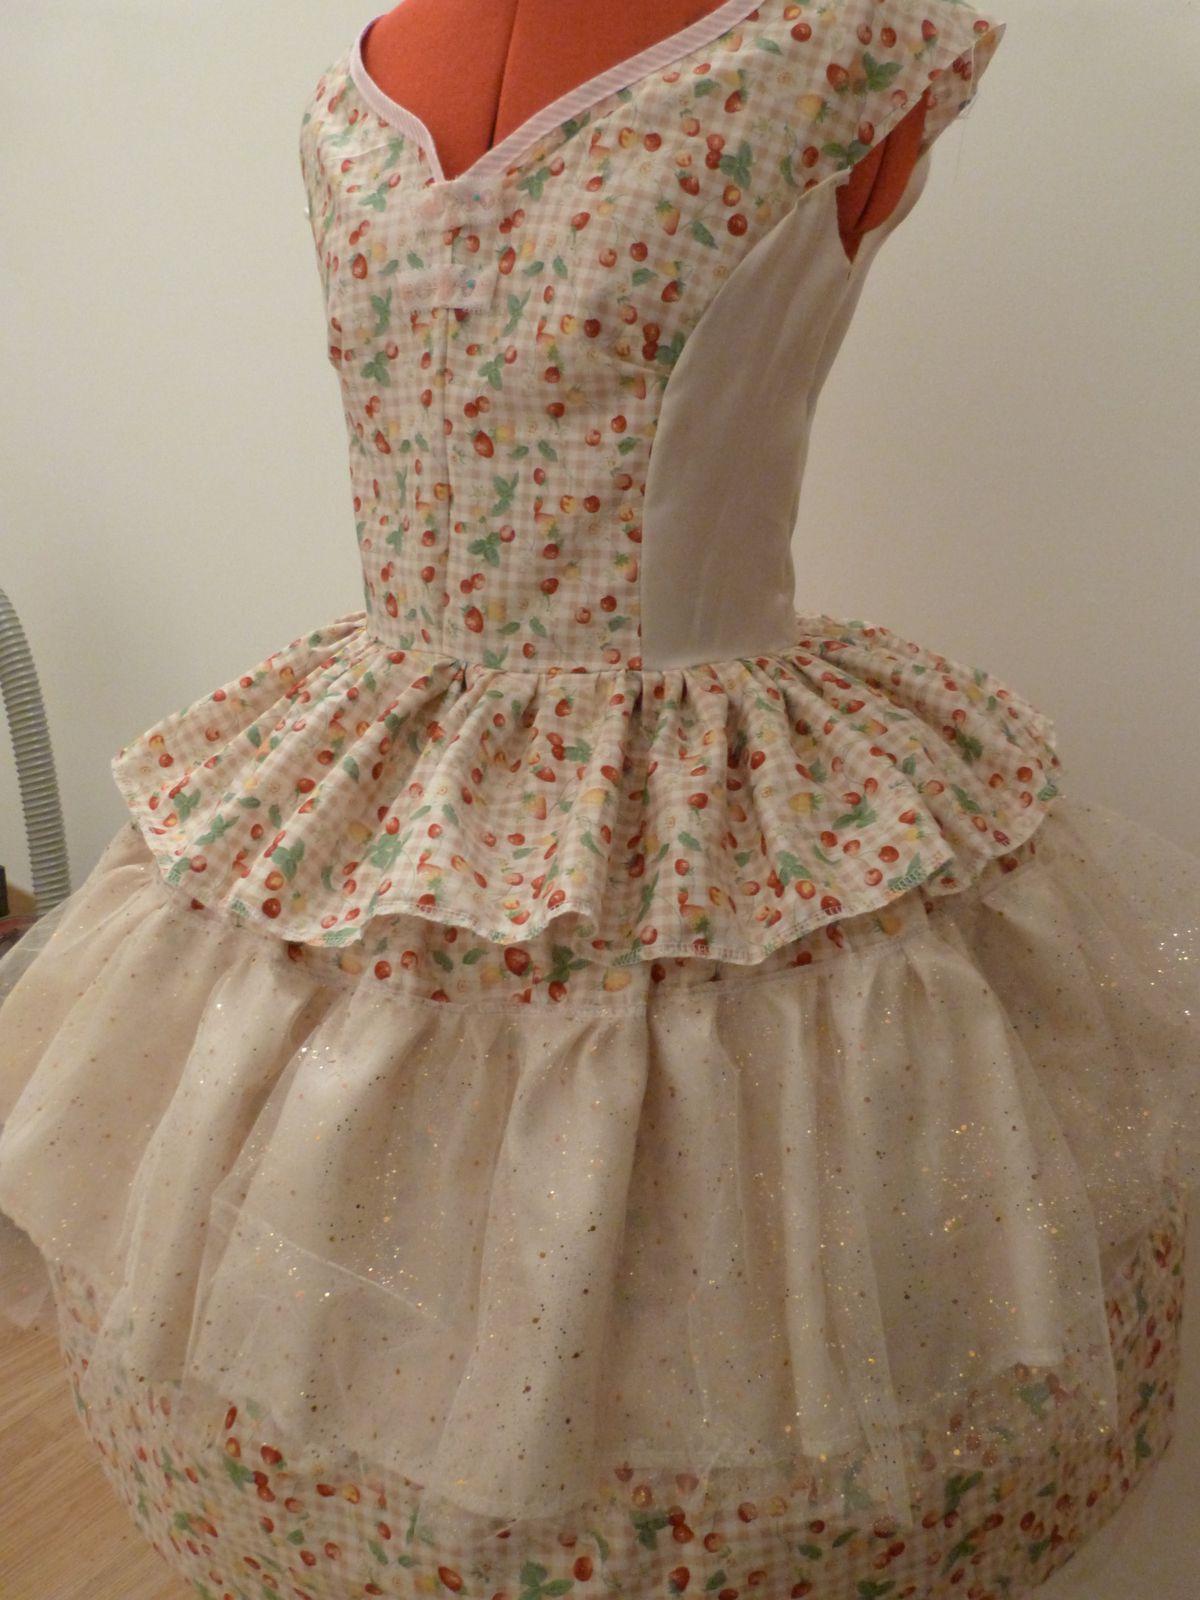 Costume &quot&#x3B;the sugar dress&quot&#x3B;